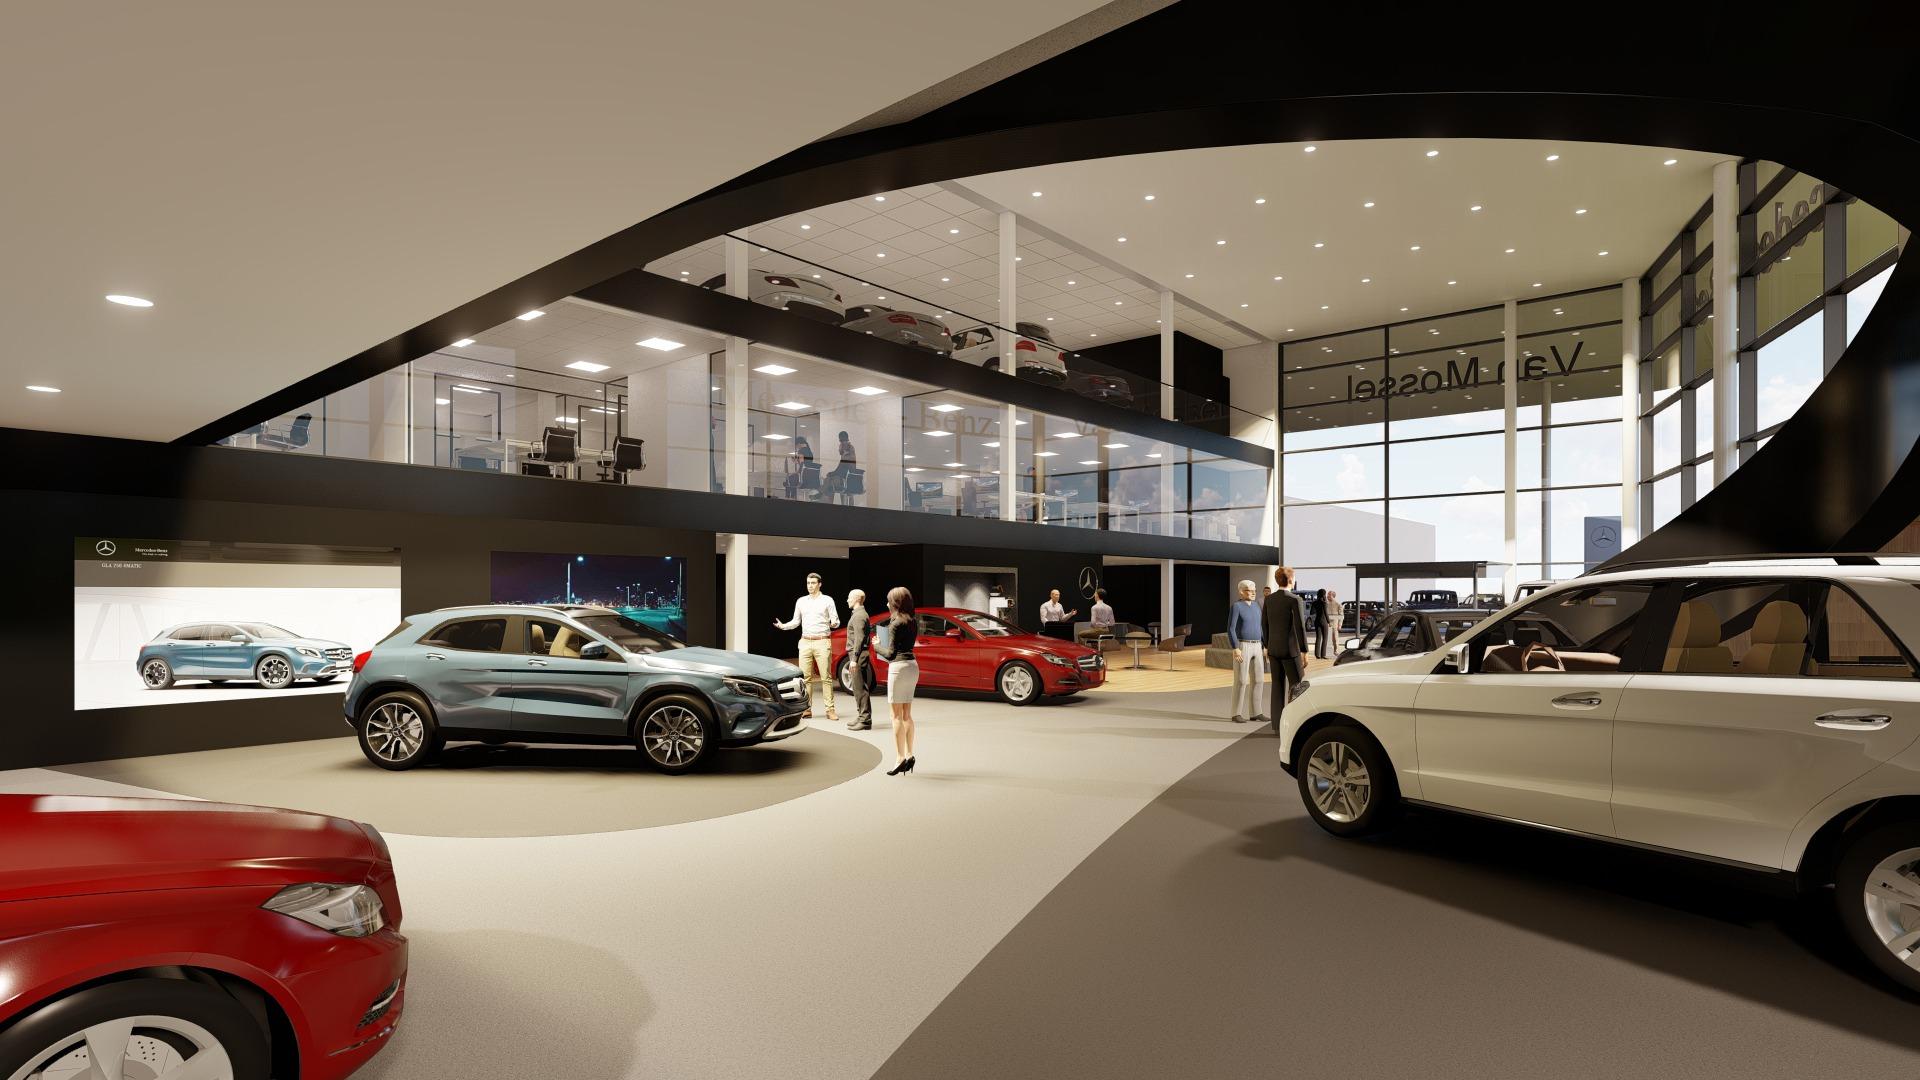 Artist Impression Nieuwbouw Van Mossel Mercedes-Benz showroom Rotterdam (Charlois)